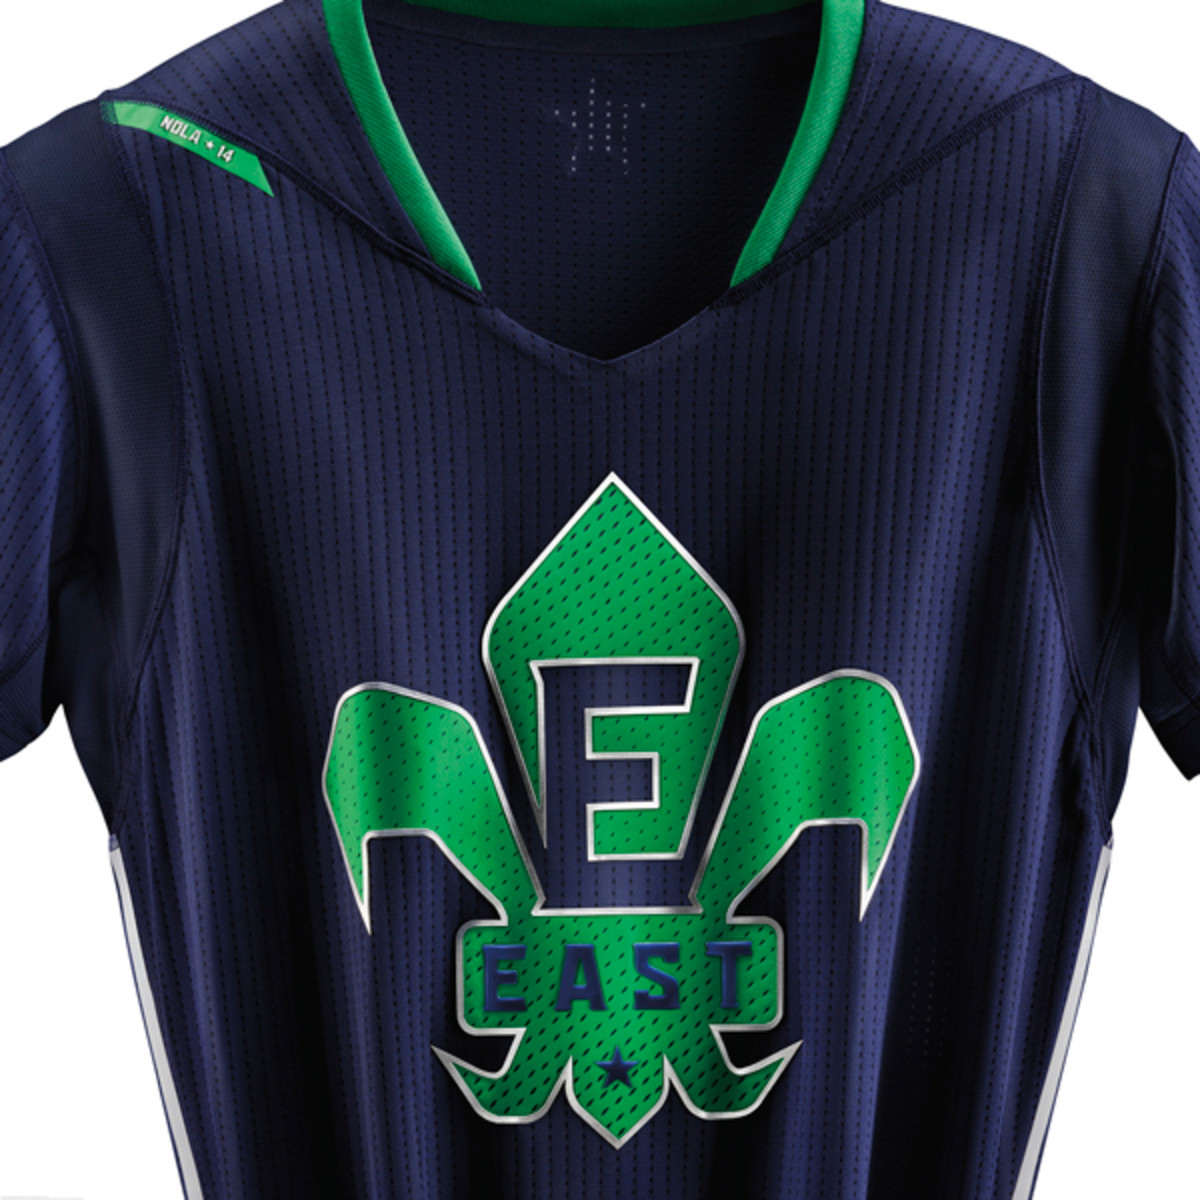 2014 nba all star jersey